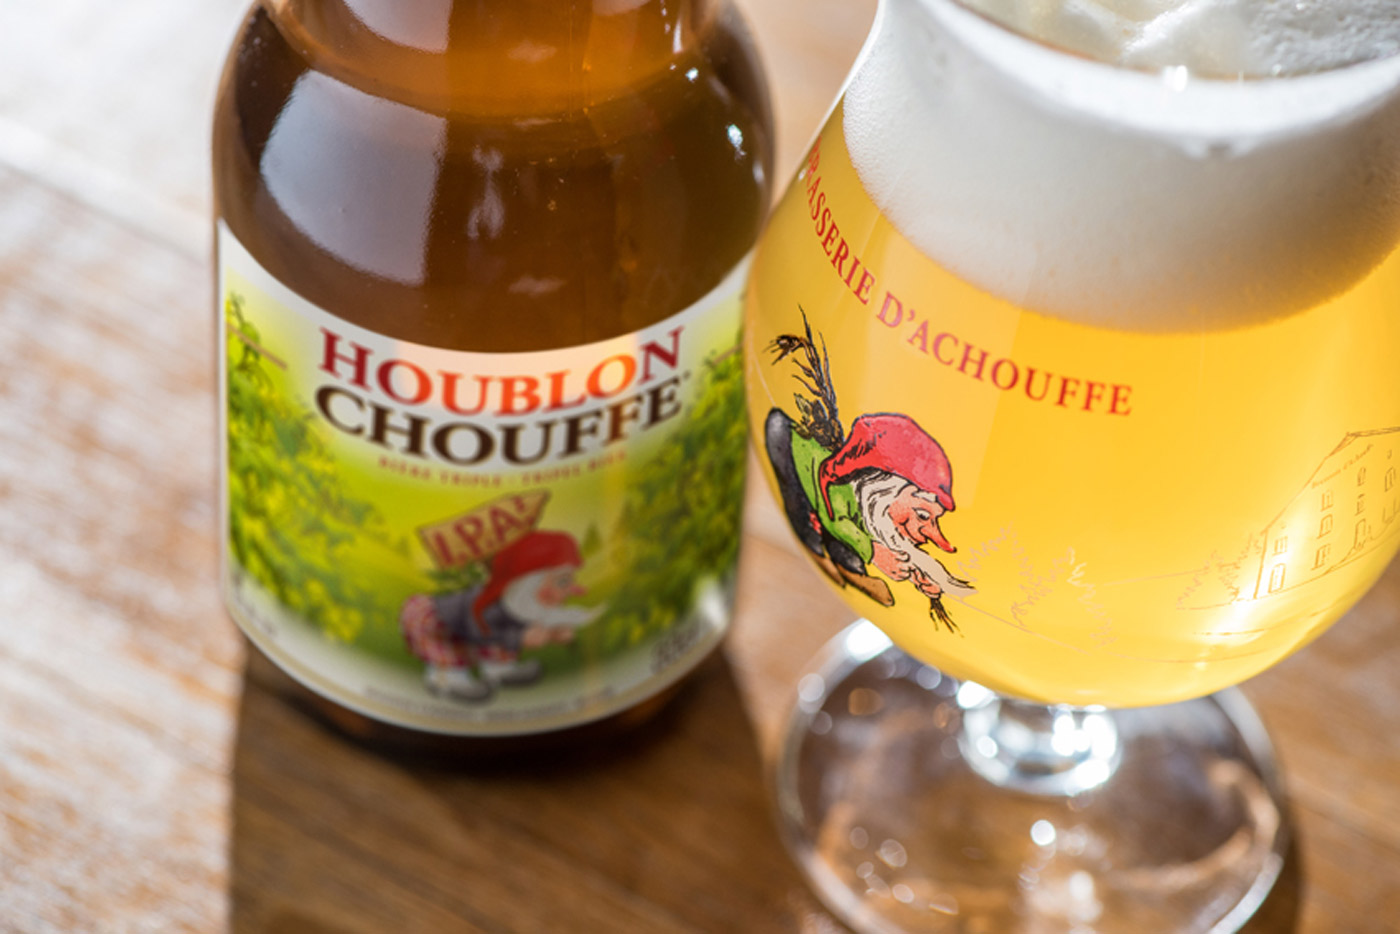 Houblon Chouffe IPA Tripel